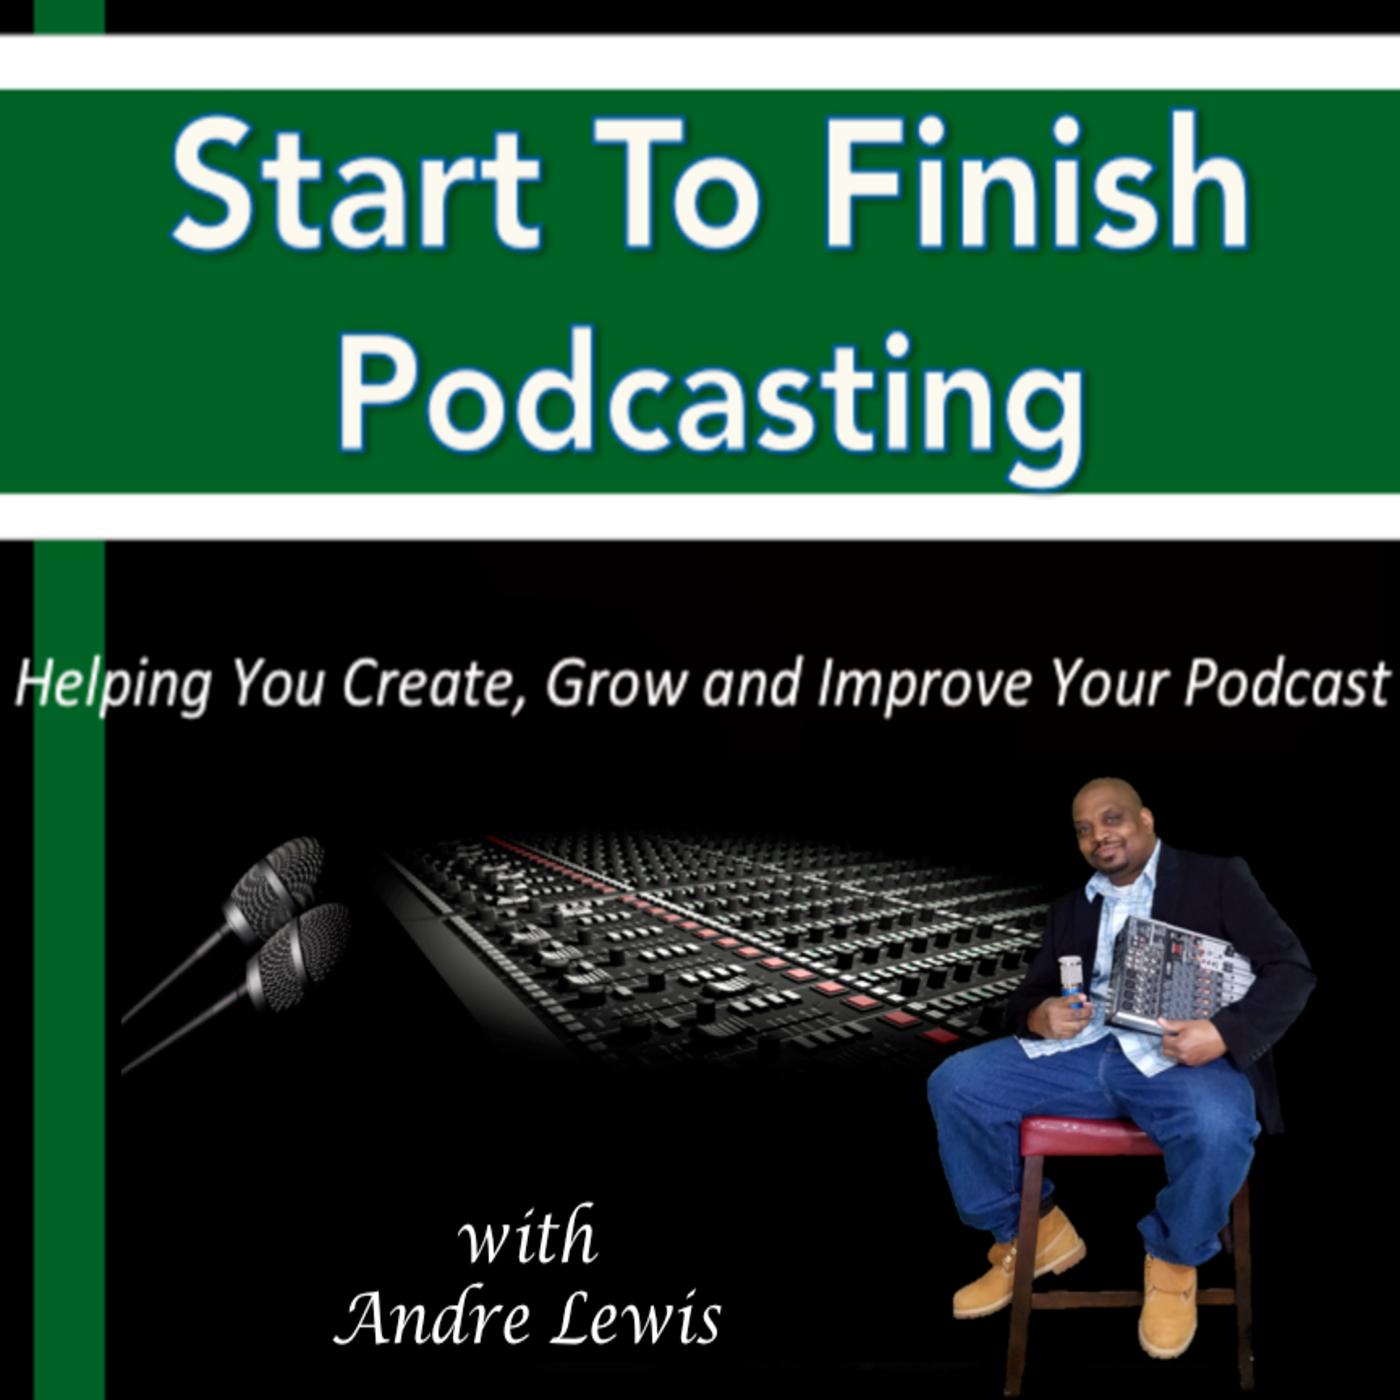 starttofinishpodcasting's podcast show art